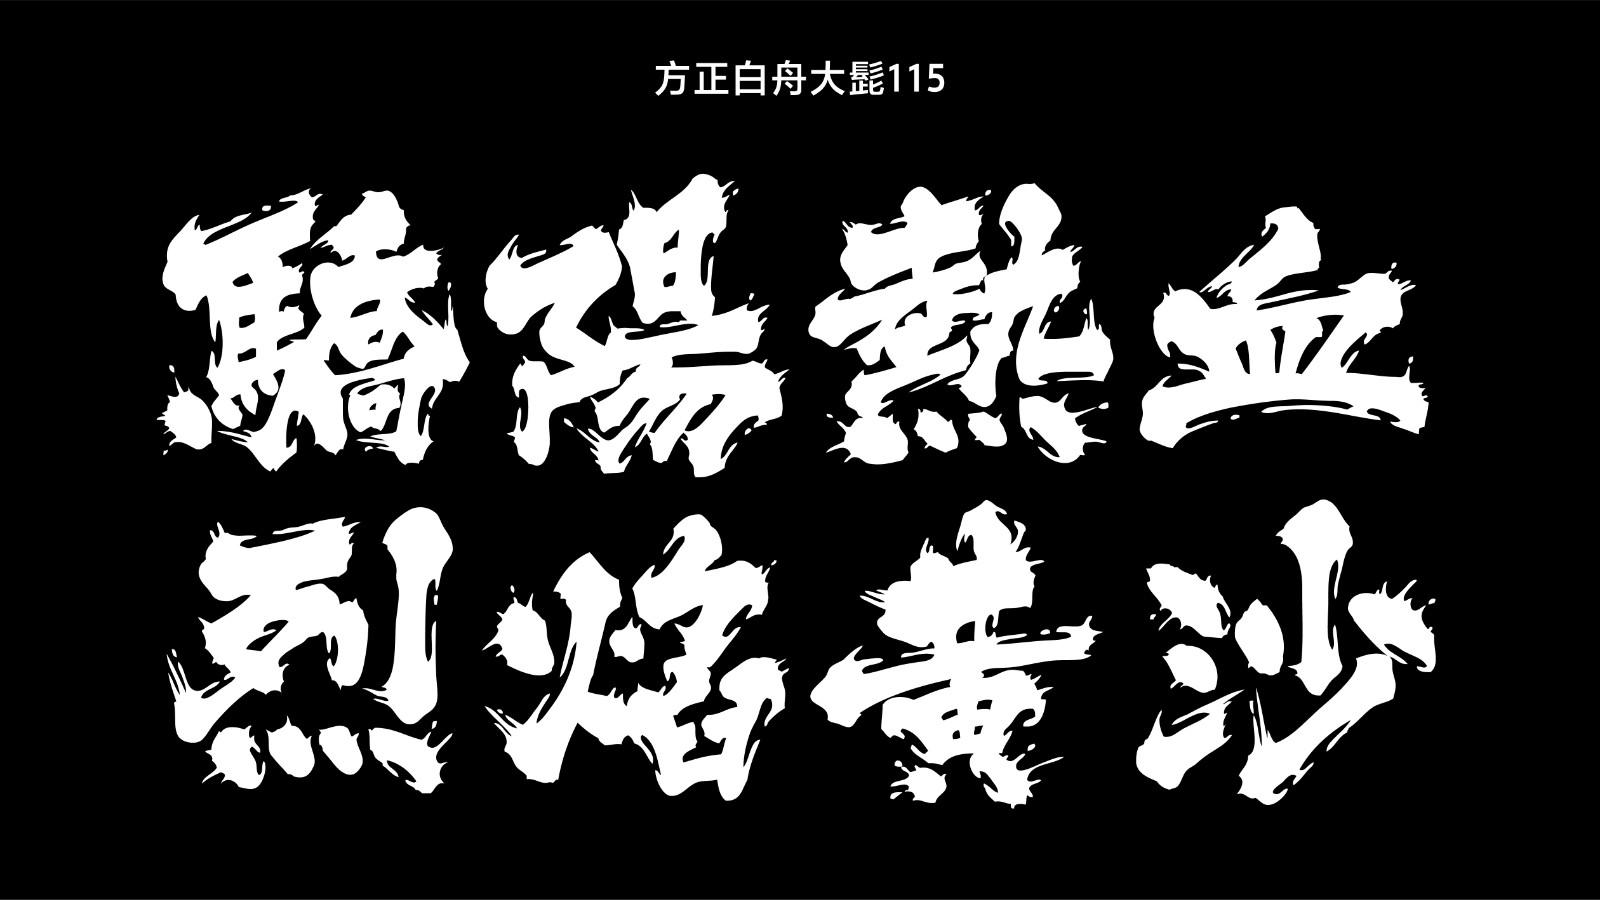 https://ft-bk1.oss-cn-zhangjiakou.aliyuncs.com/Public/Uploads/img/n_content_20201210180158_6752.jpg